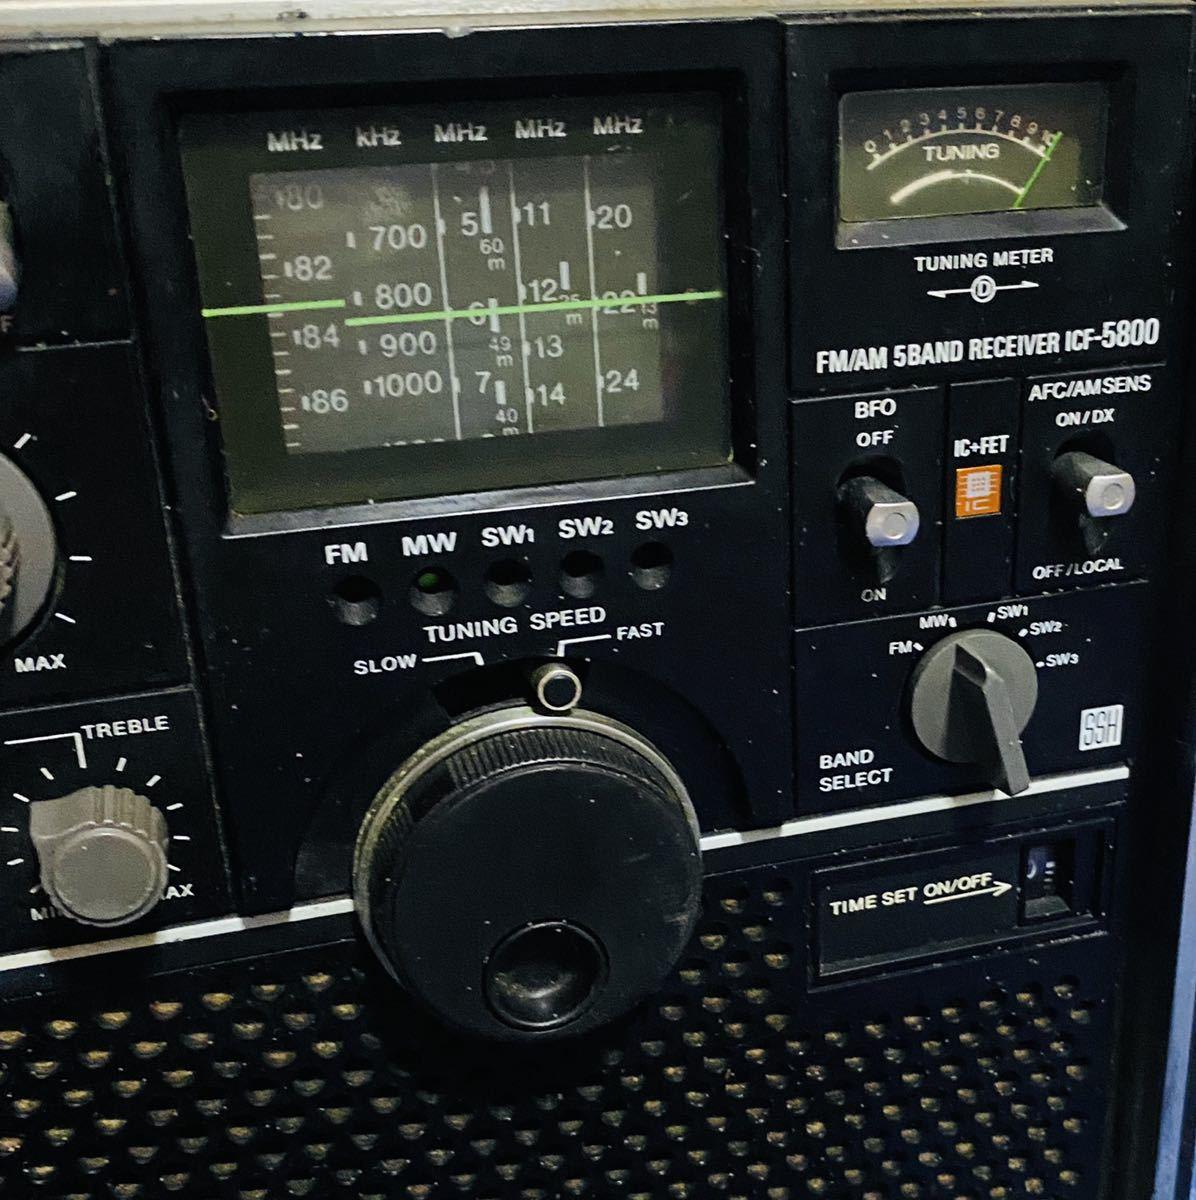 SONY ICF-5800 ラジオ ブラック Skysensor FM/AM 5BAND RECEIVER ソニー スカイセンサー ライトOK_画像3